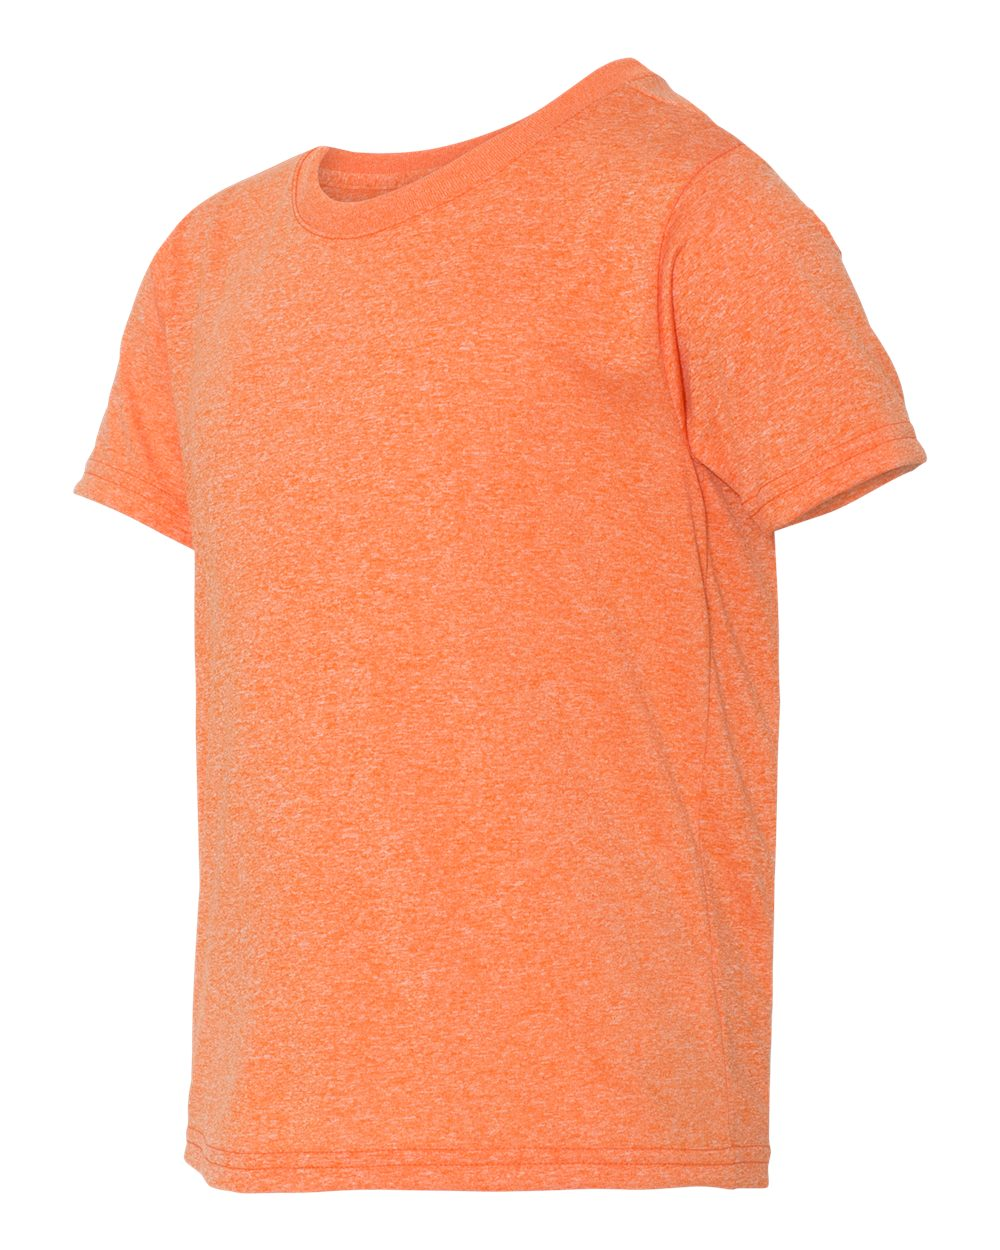 click to view Heather Sport Orange